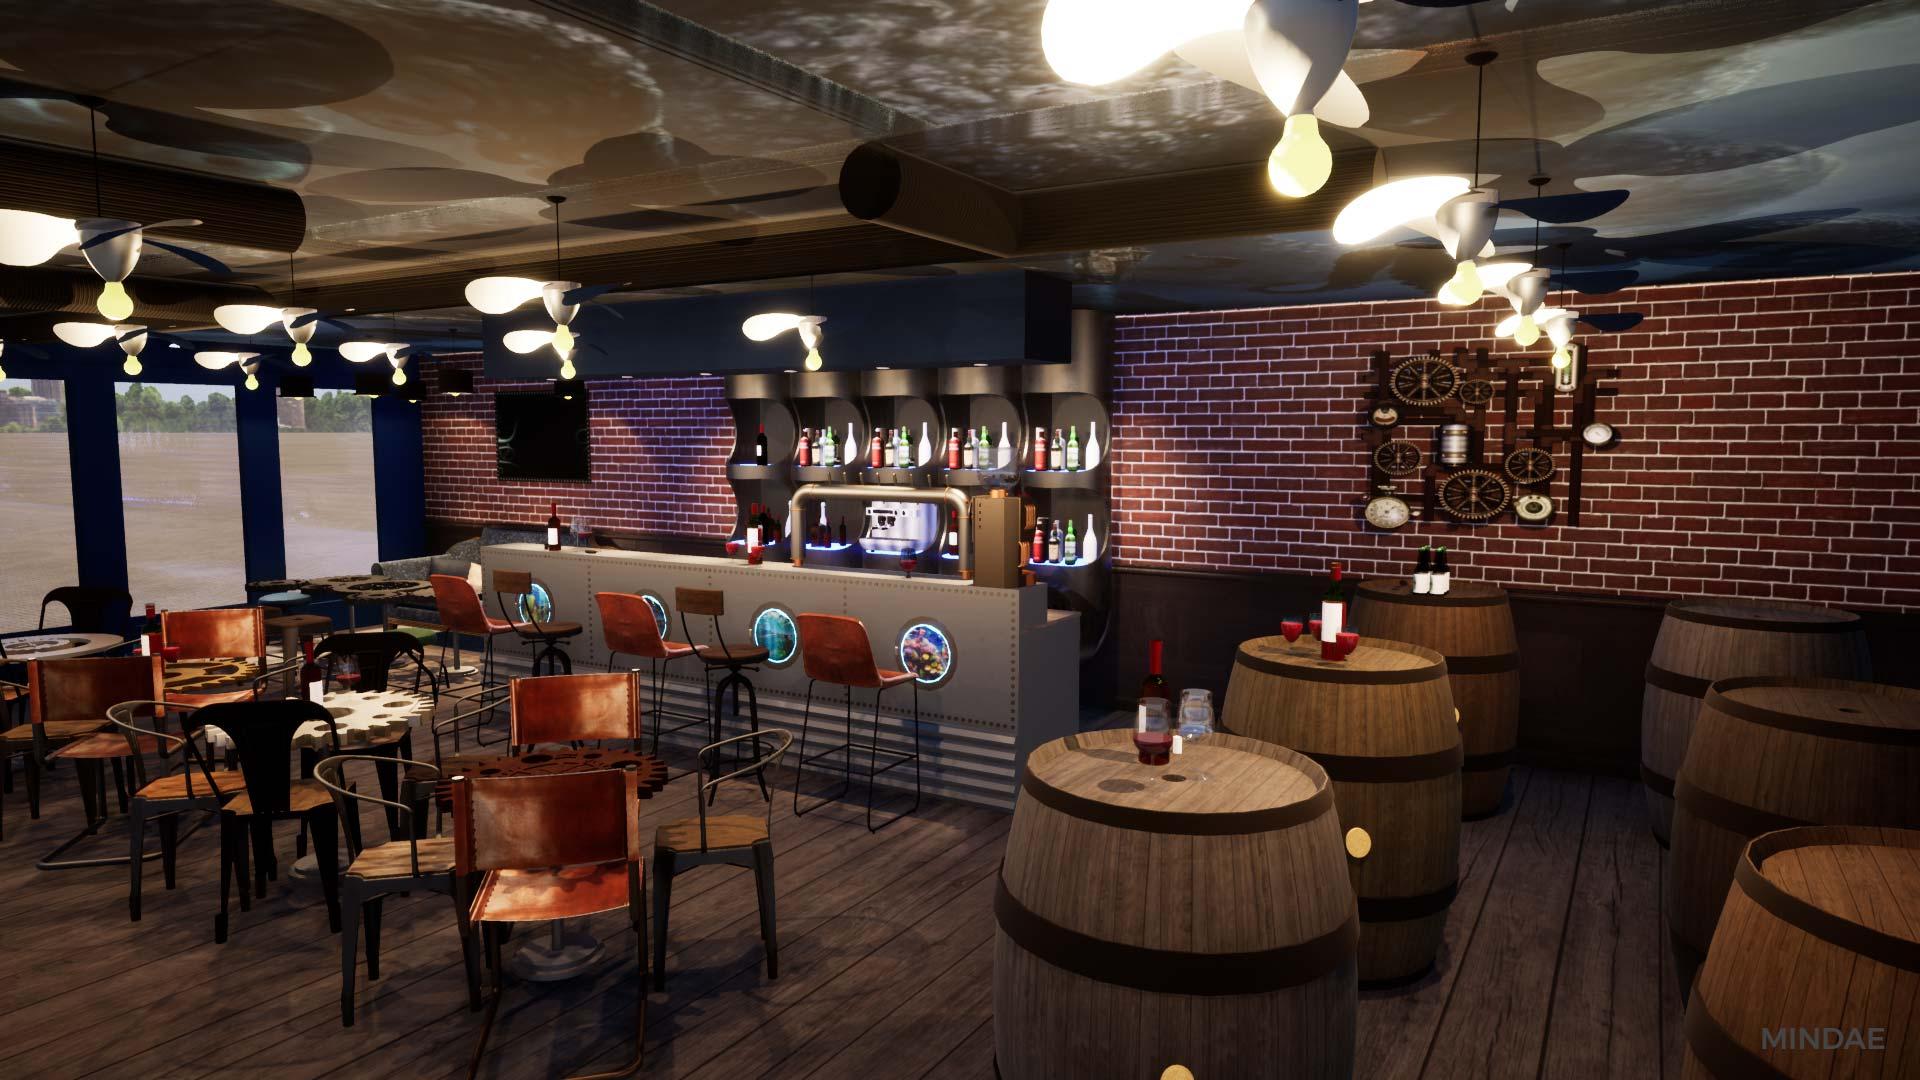 Mindae_3D_machiniste_bar_caen_steampunk_meca_agencement_comptoir_banquettes-(5)